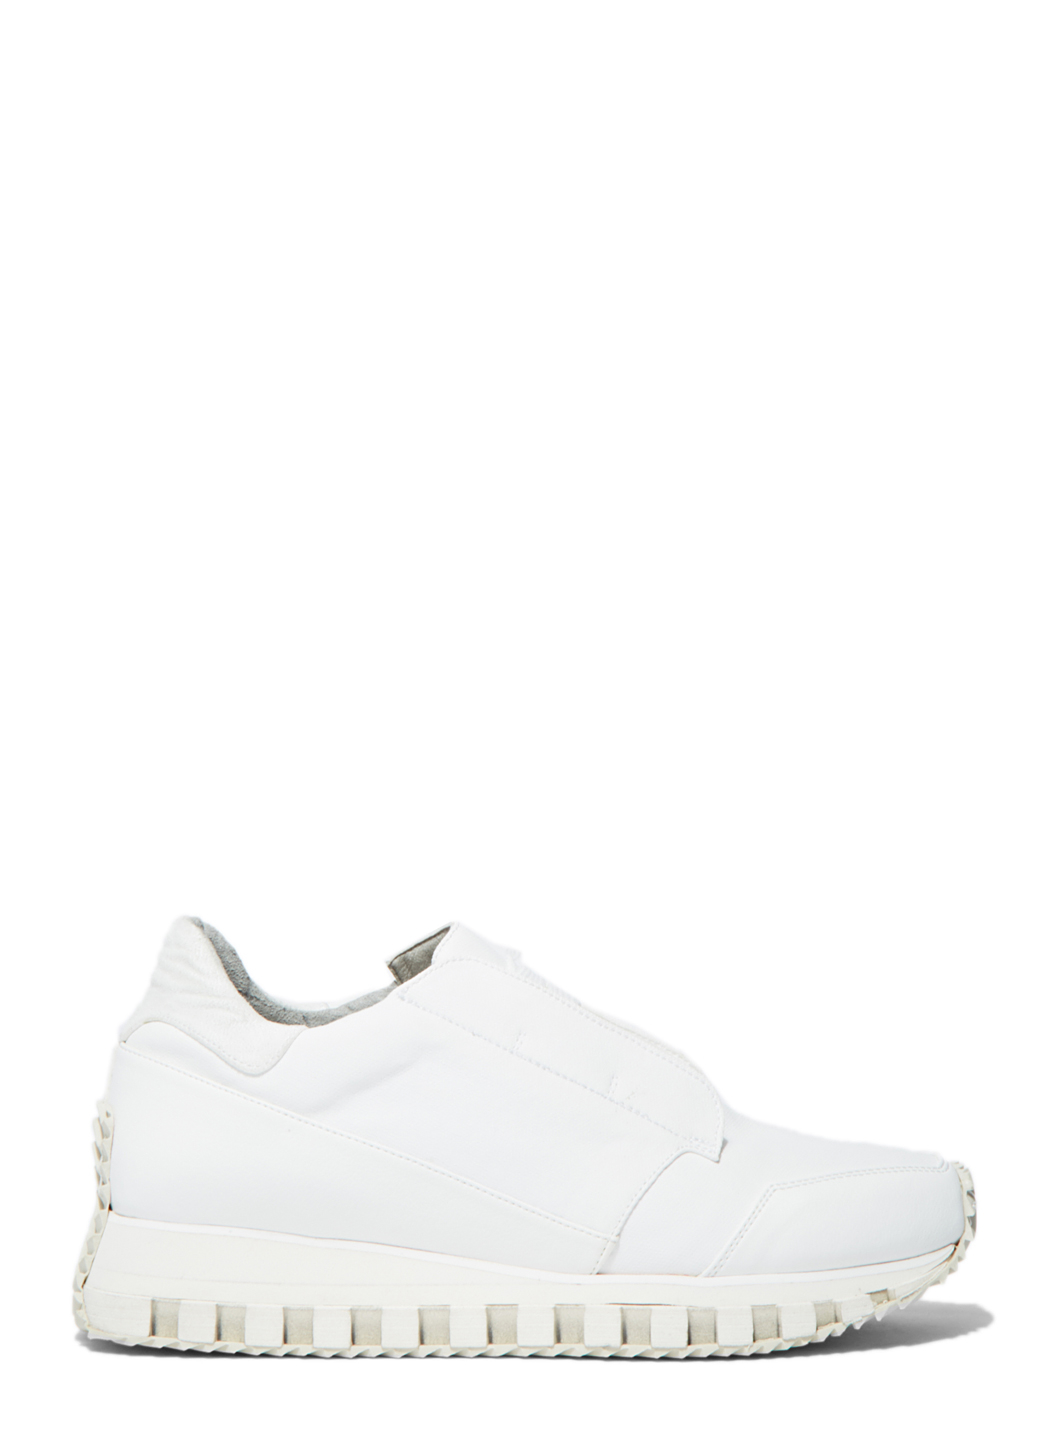 FOOTWEAR - Low-tops & sneakers Rombaut 2J3S6